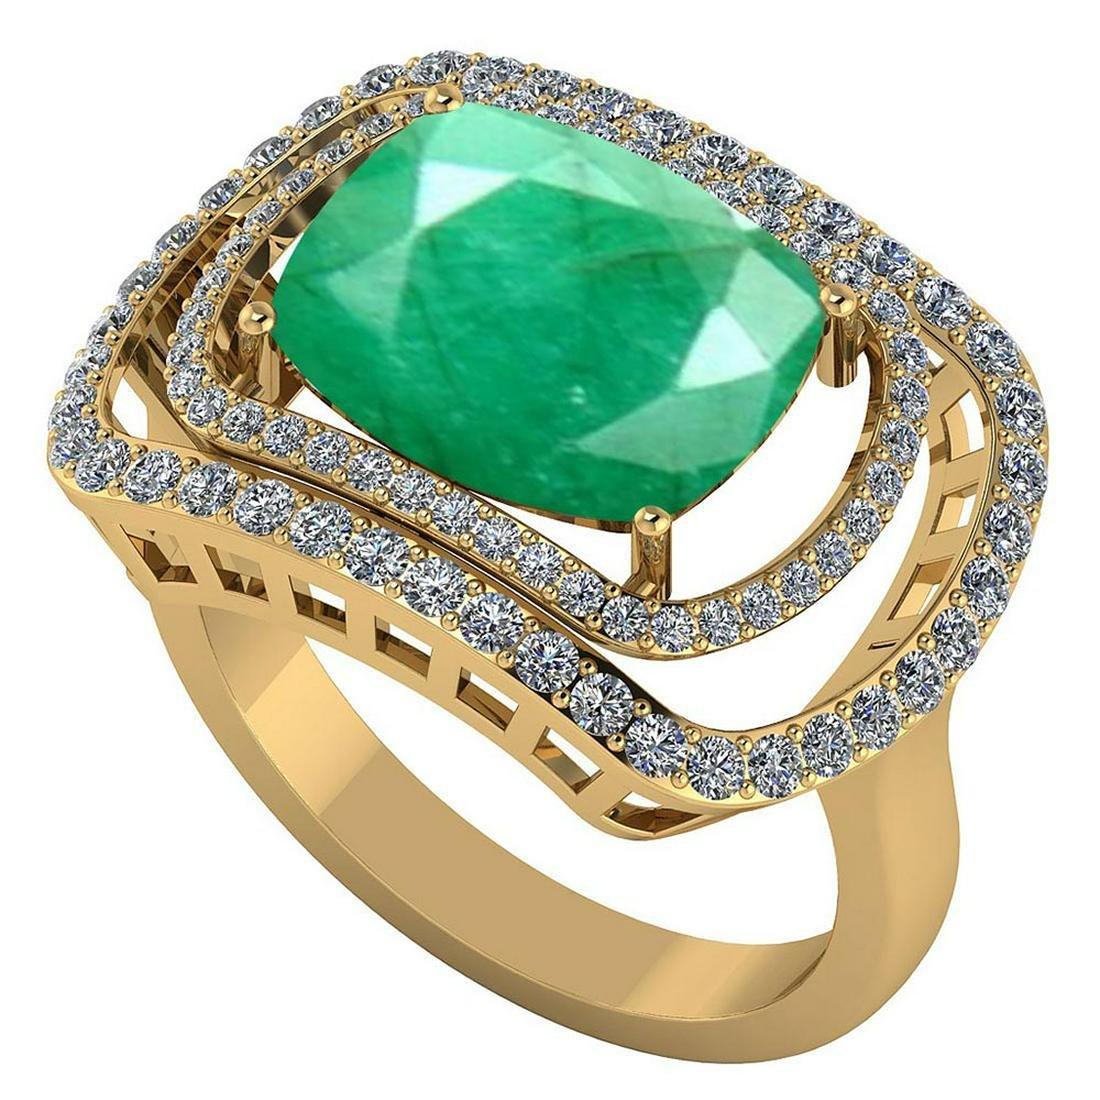 Certified 3.50 CTW Genuine Emerlad And Diamond 14K Yell